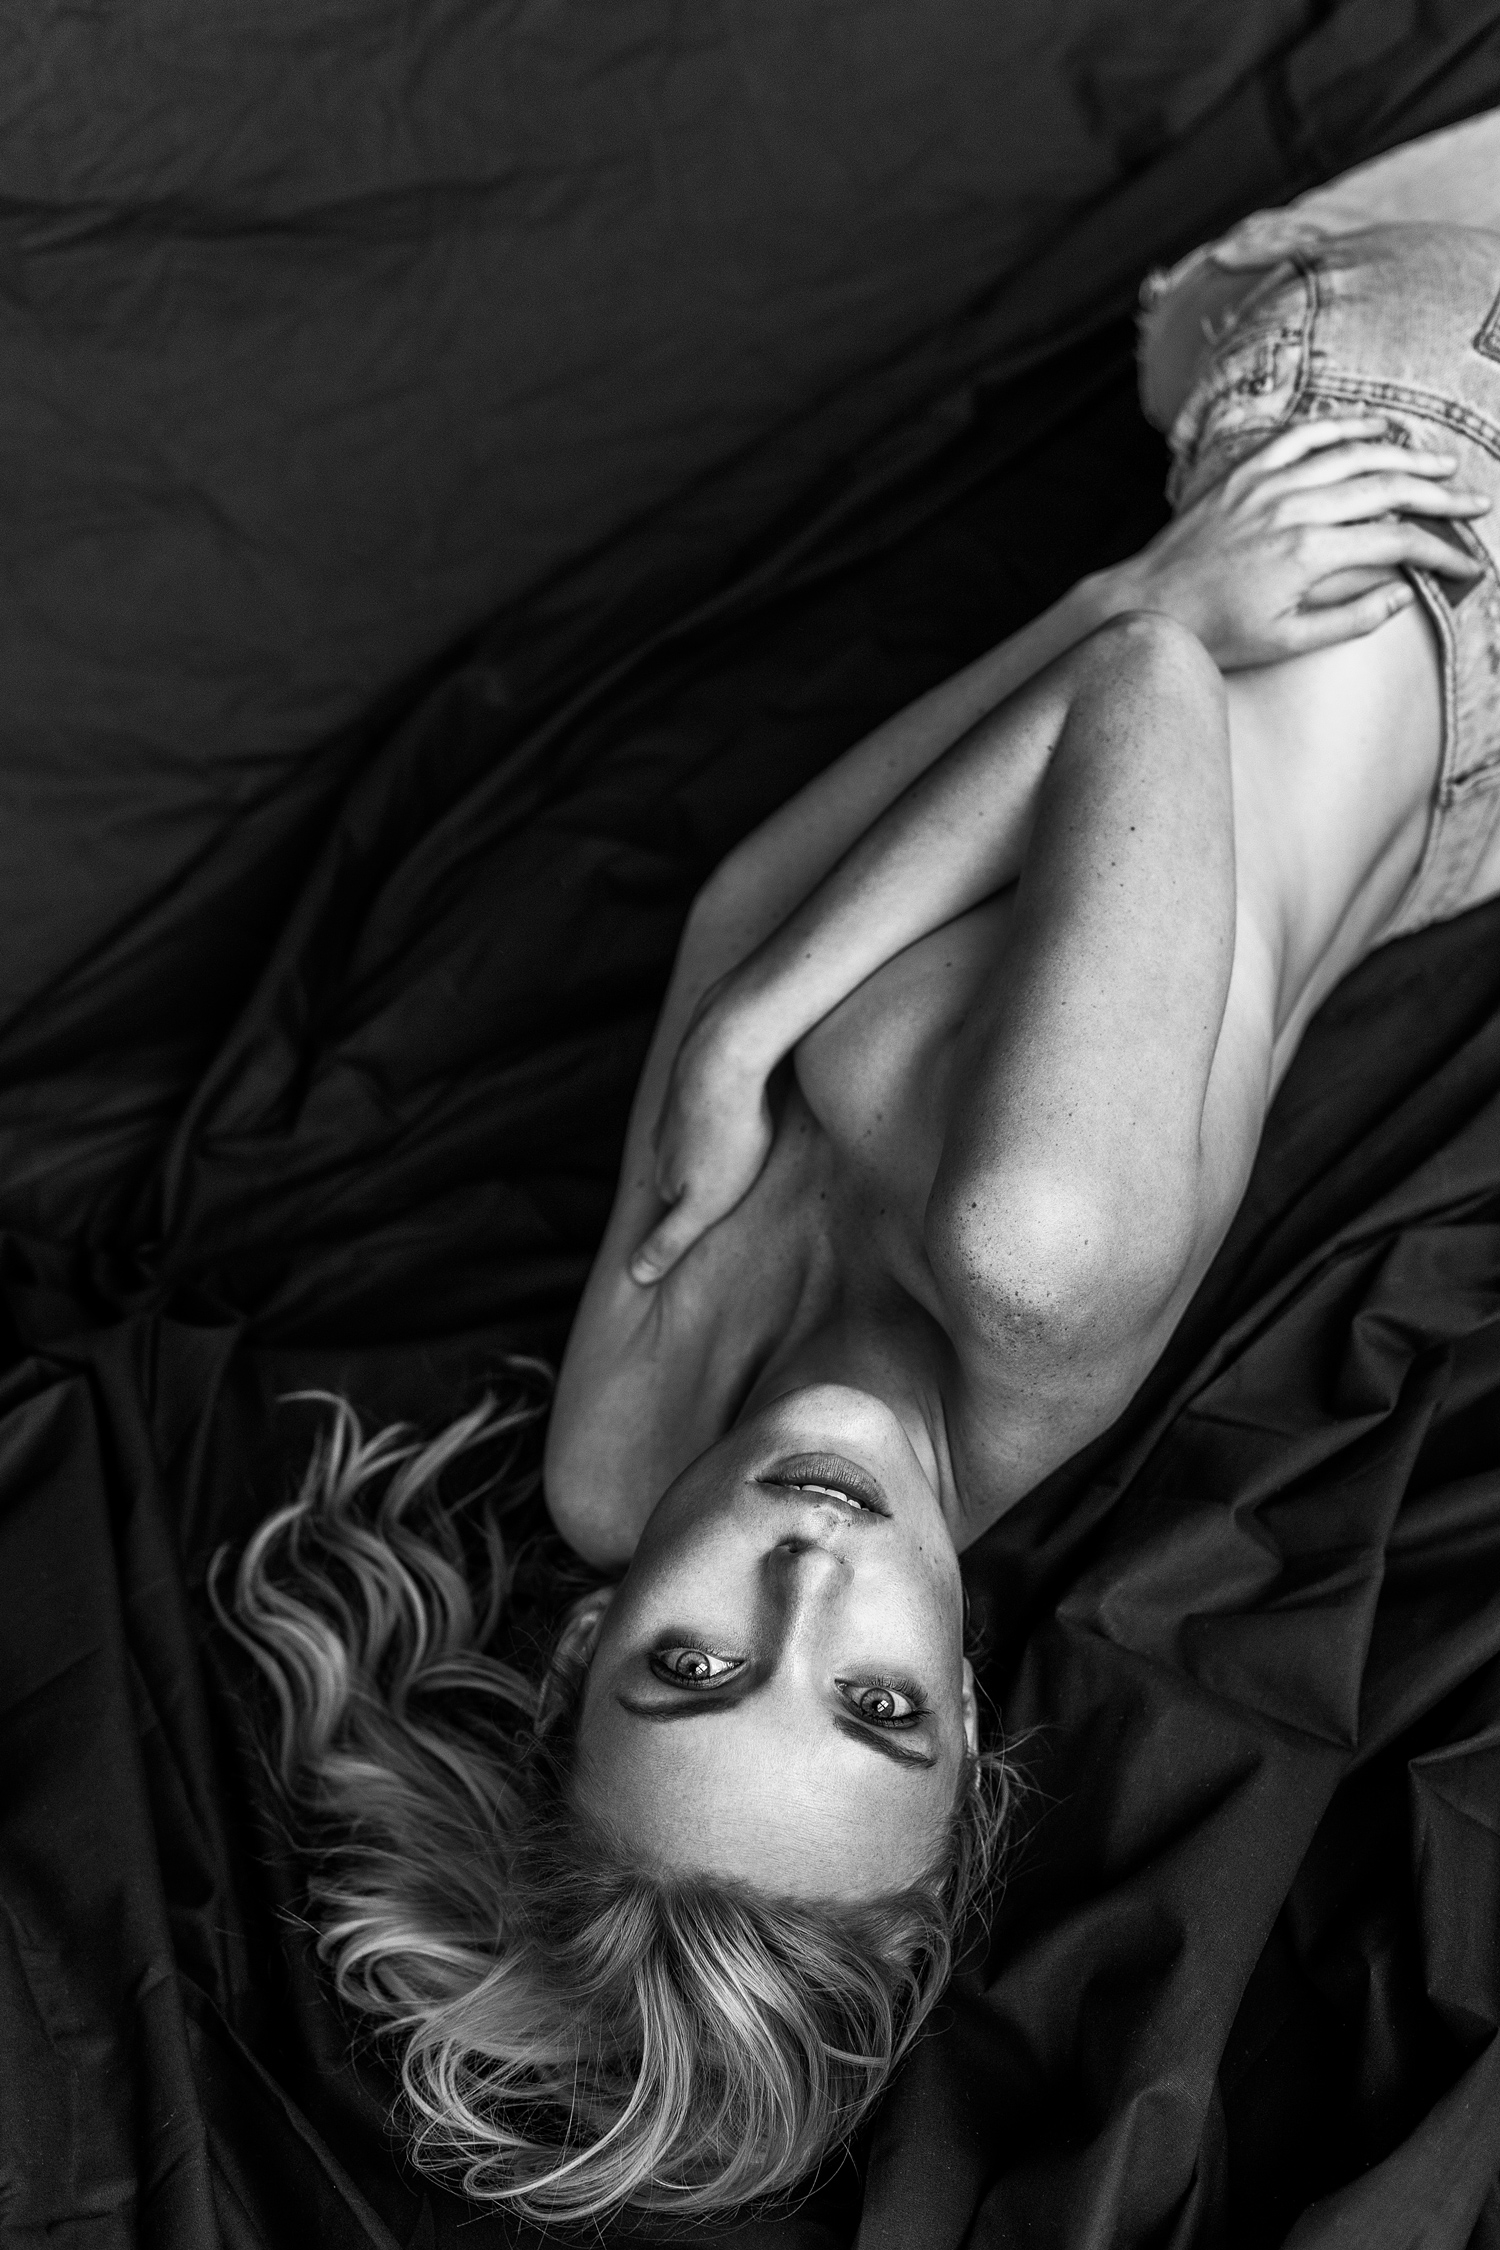 Weronika---Lay-copy.jpg